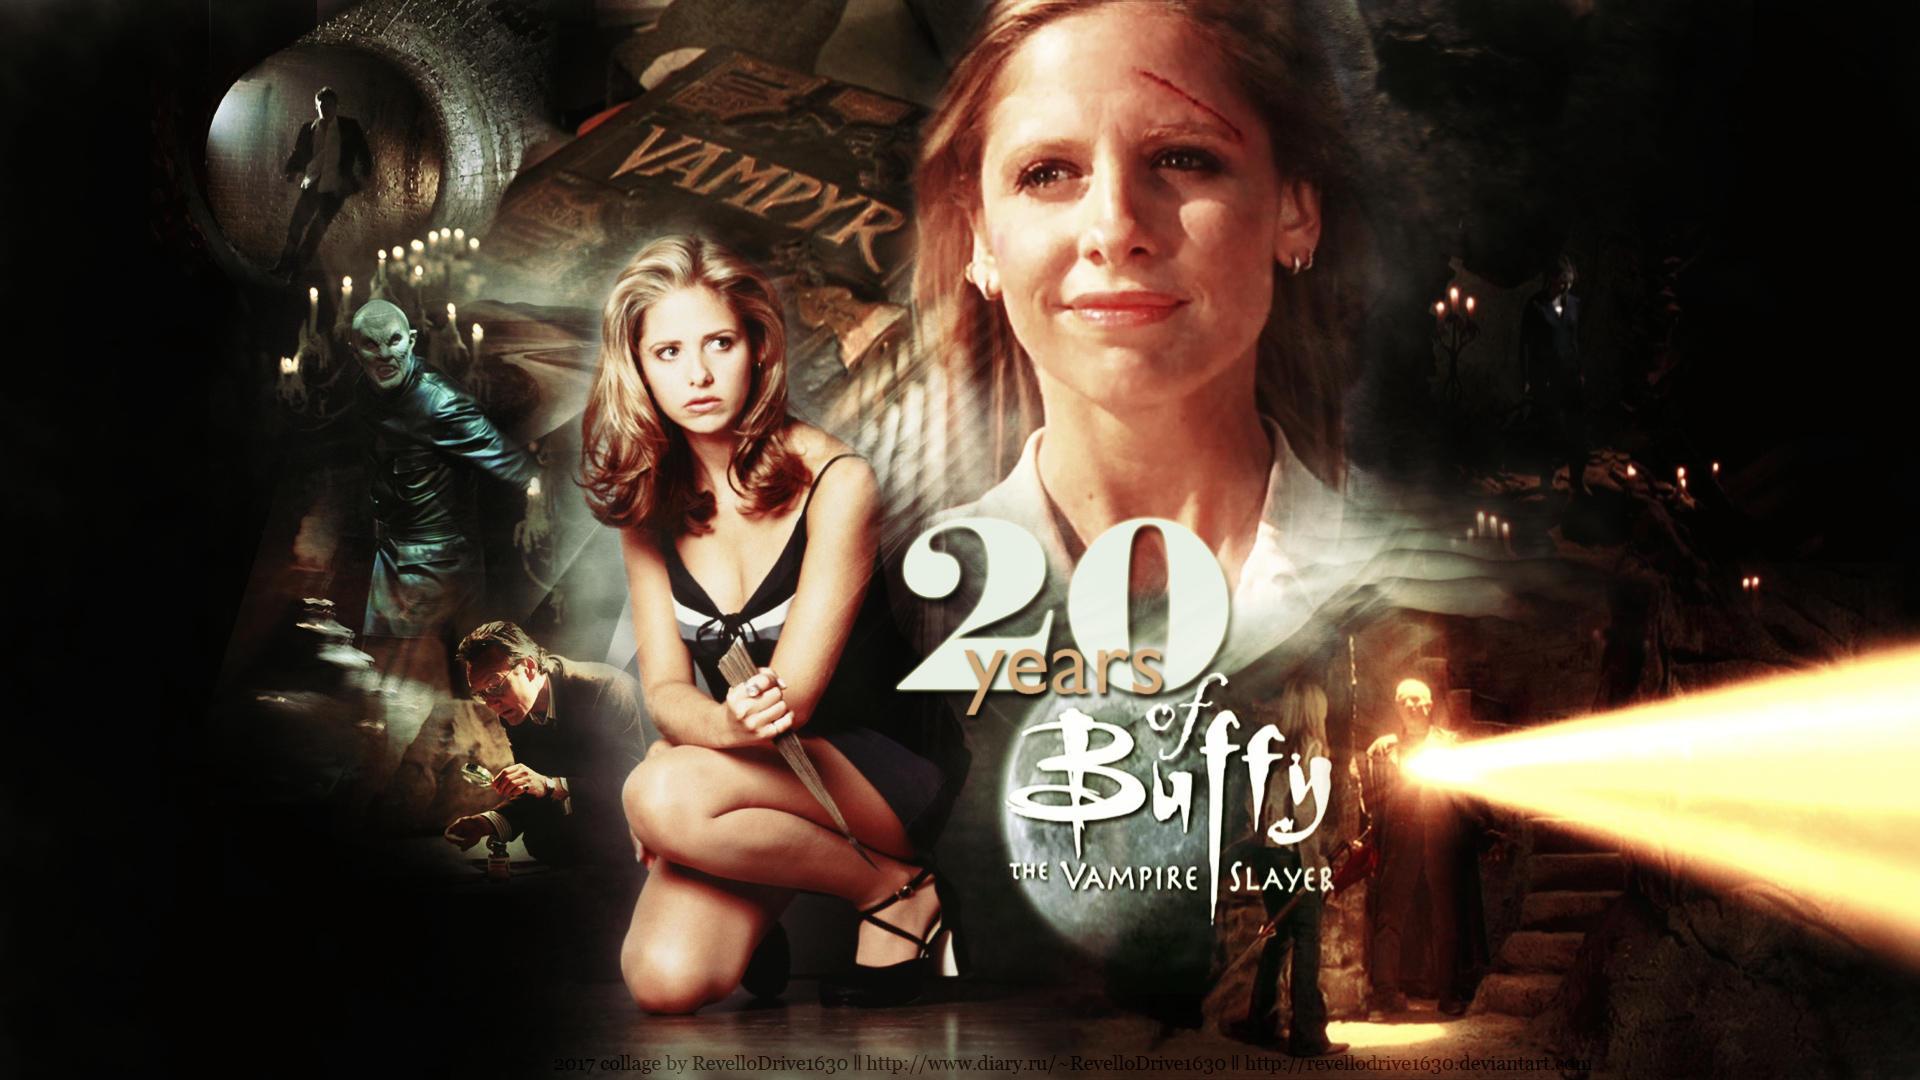 20 years of Buffy the Vampire Slayer by RevelloDrive1630